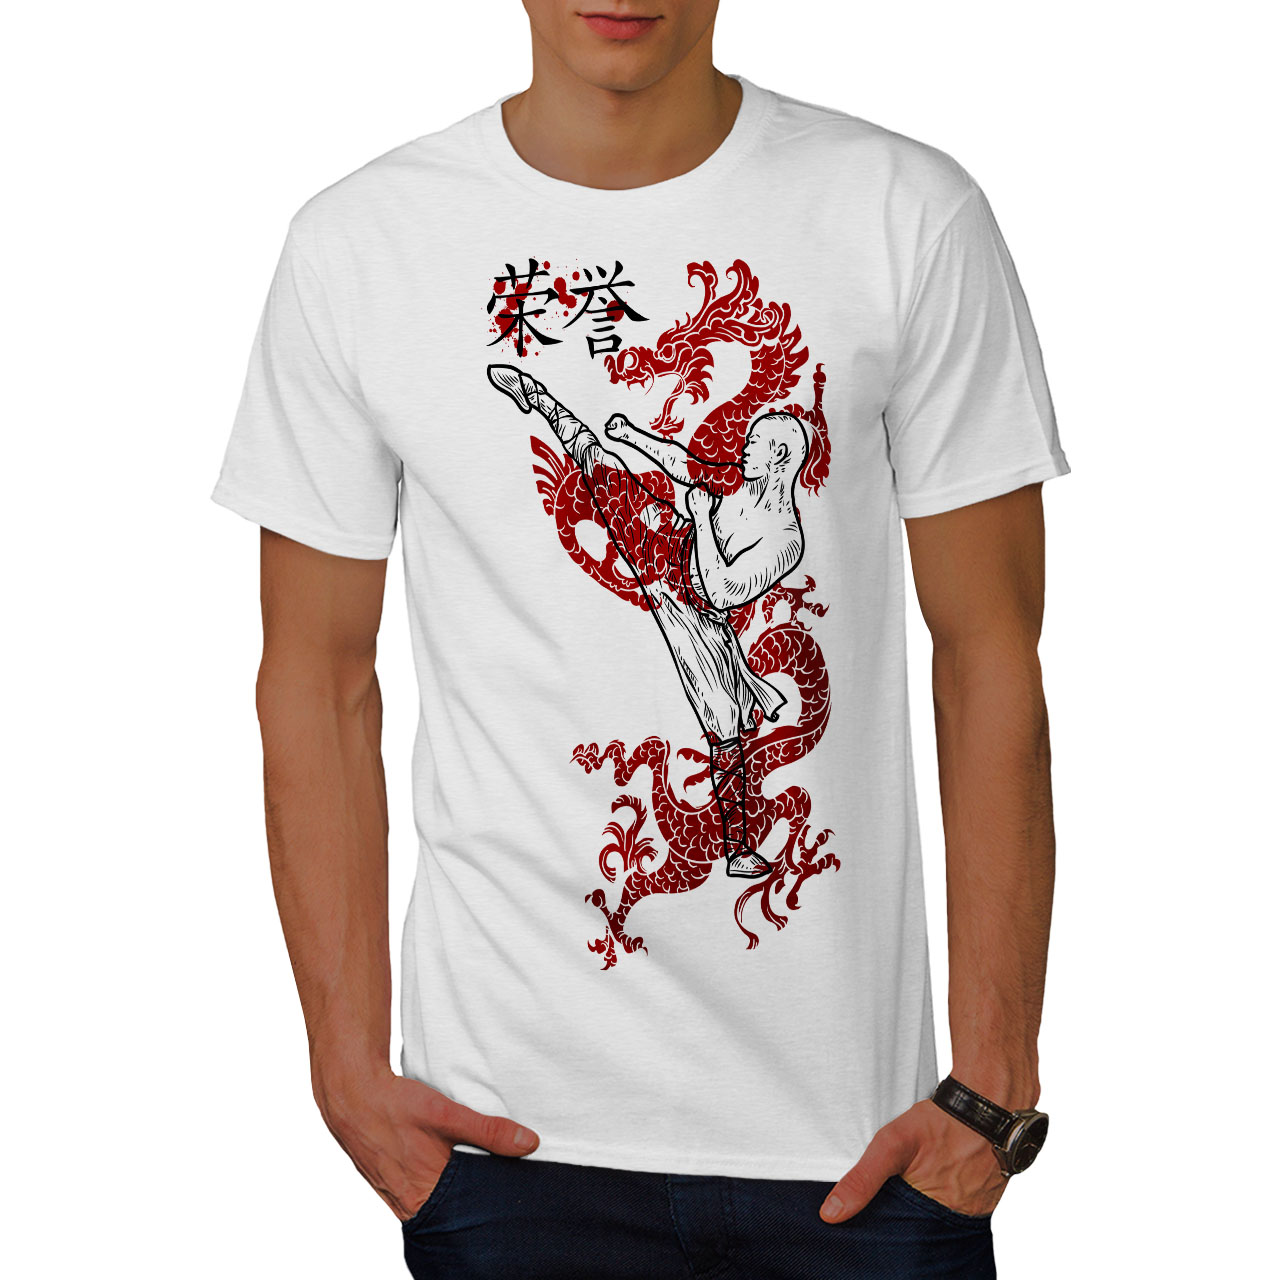 Wellcoda Katana Ninja Mens T-shirt Hieroglyph Graphic Design Printed Tee